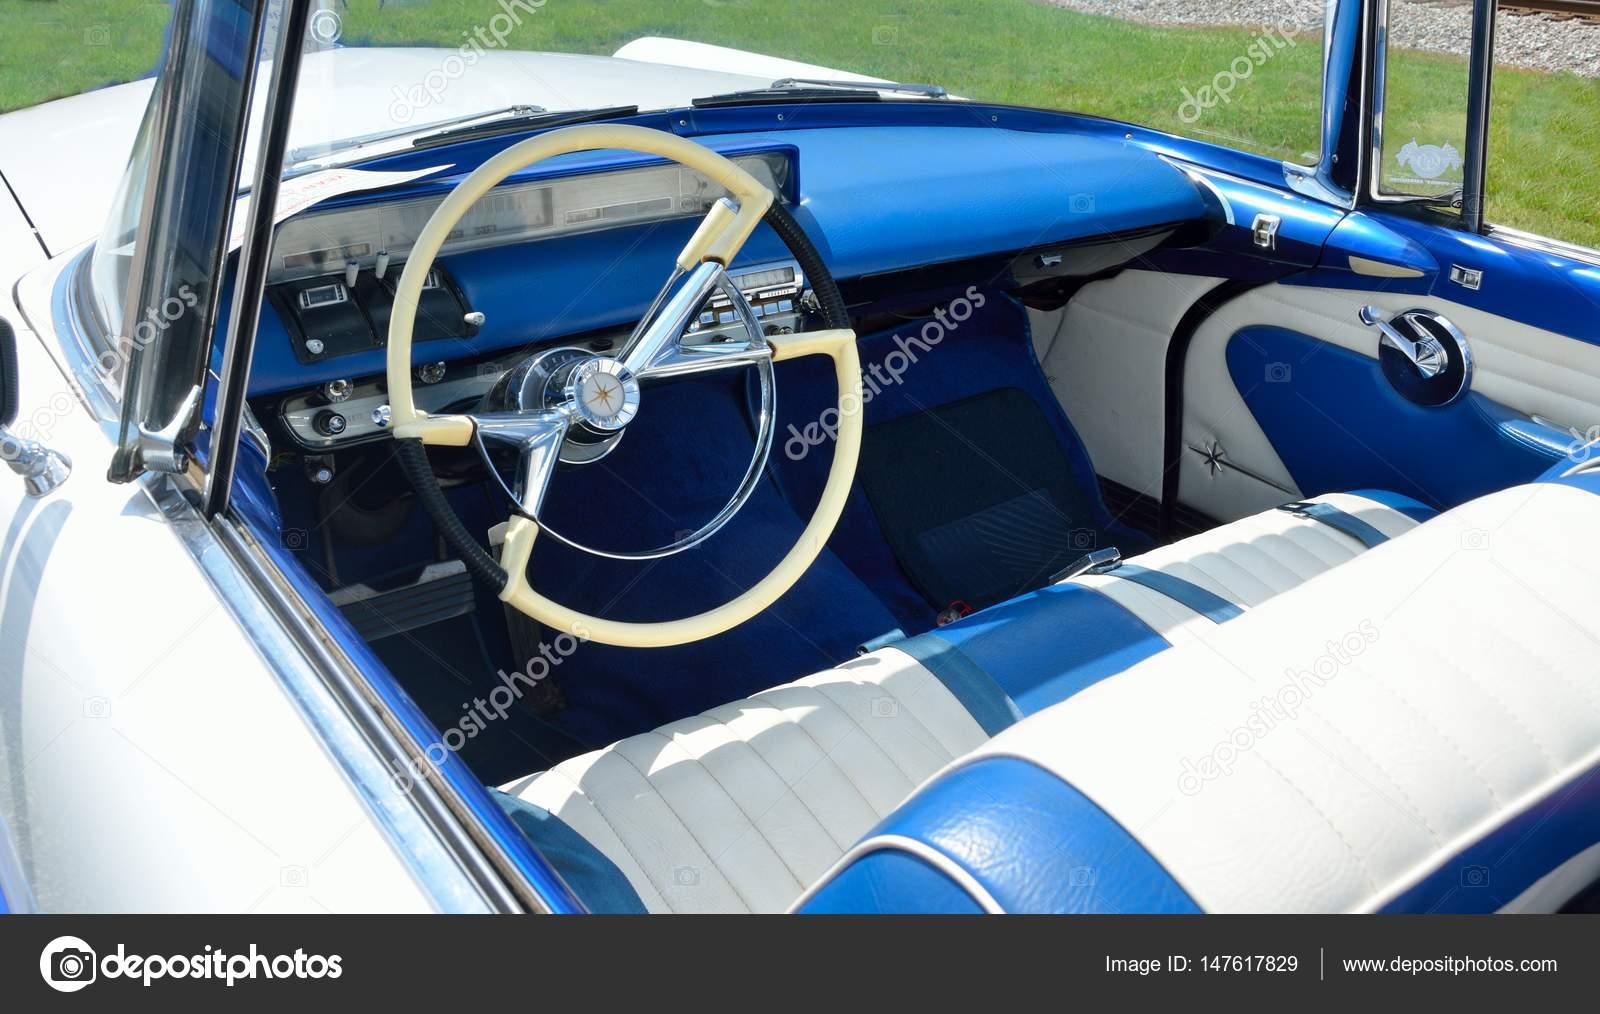 Classic Car Interior Design Stock Editorial Photo C Howdy76 147617829